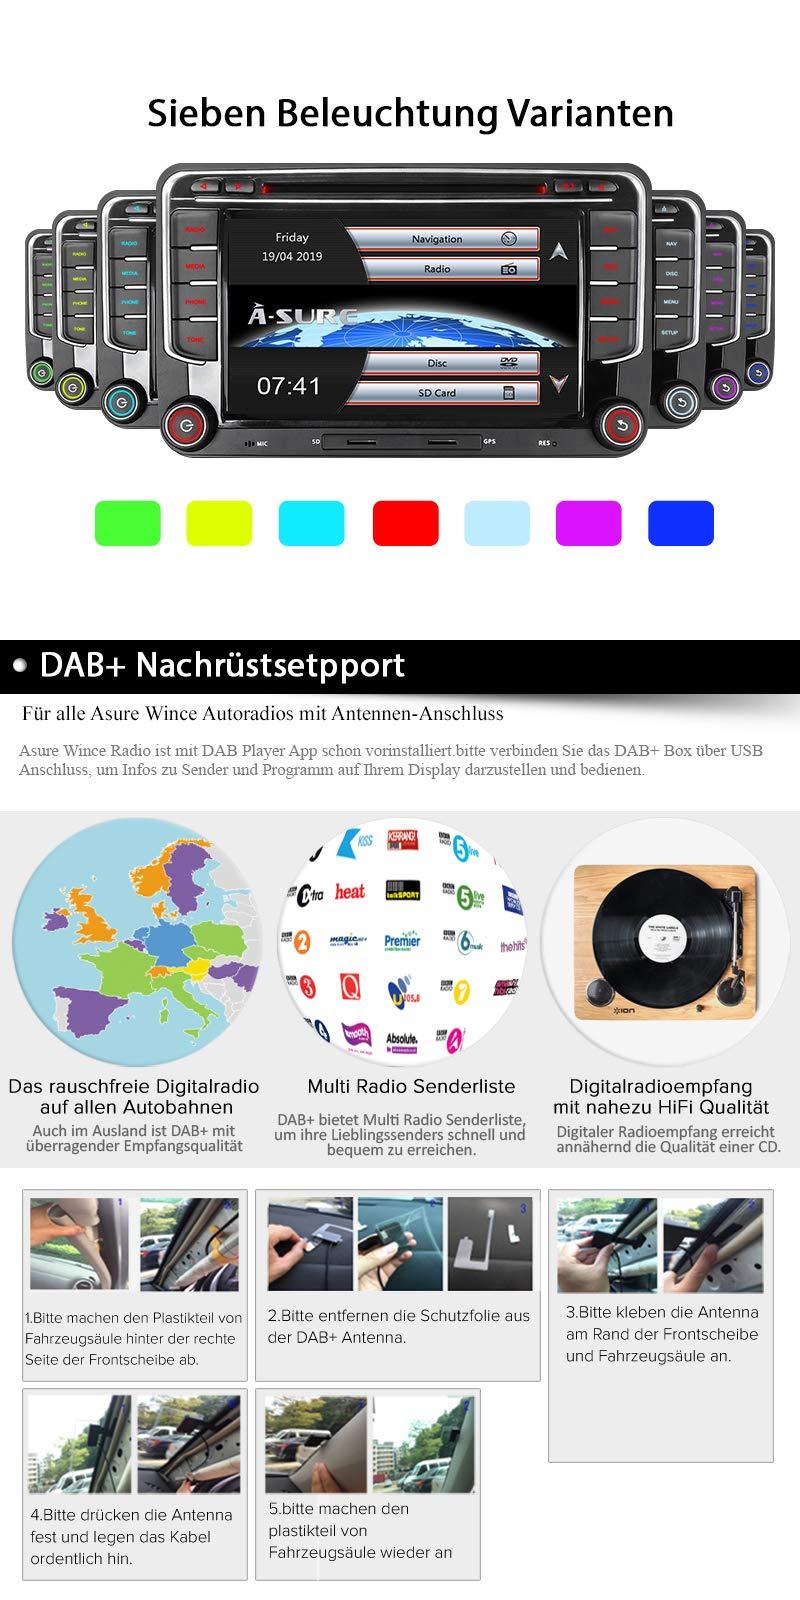 16GB-SD-Karte-7-AUTORADIO-DVD-GPS-Fr-VW-Golf-56PassatTiguanPoloJettaSkoda-Fabia-OctaviaYeti-Seat-LeonTouranCandy-SharanEOS-DAB-VMCD-Mirrorlink-GPS-Navigation-USB-SD-BT-7-LED